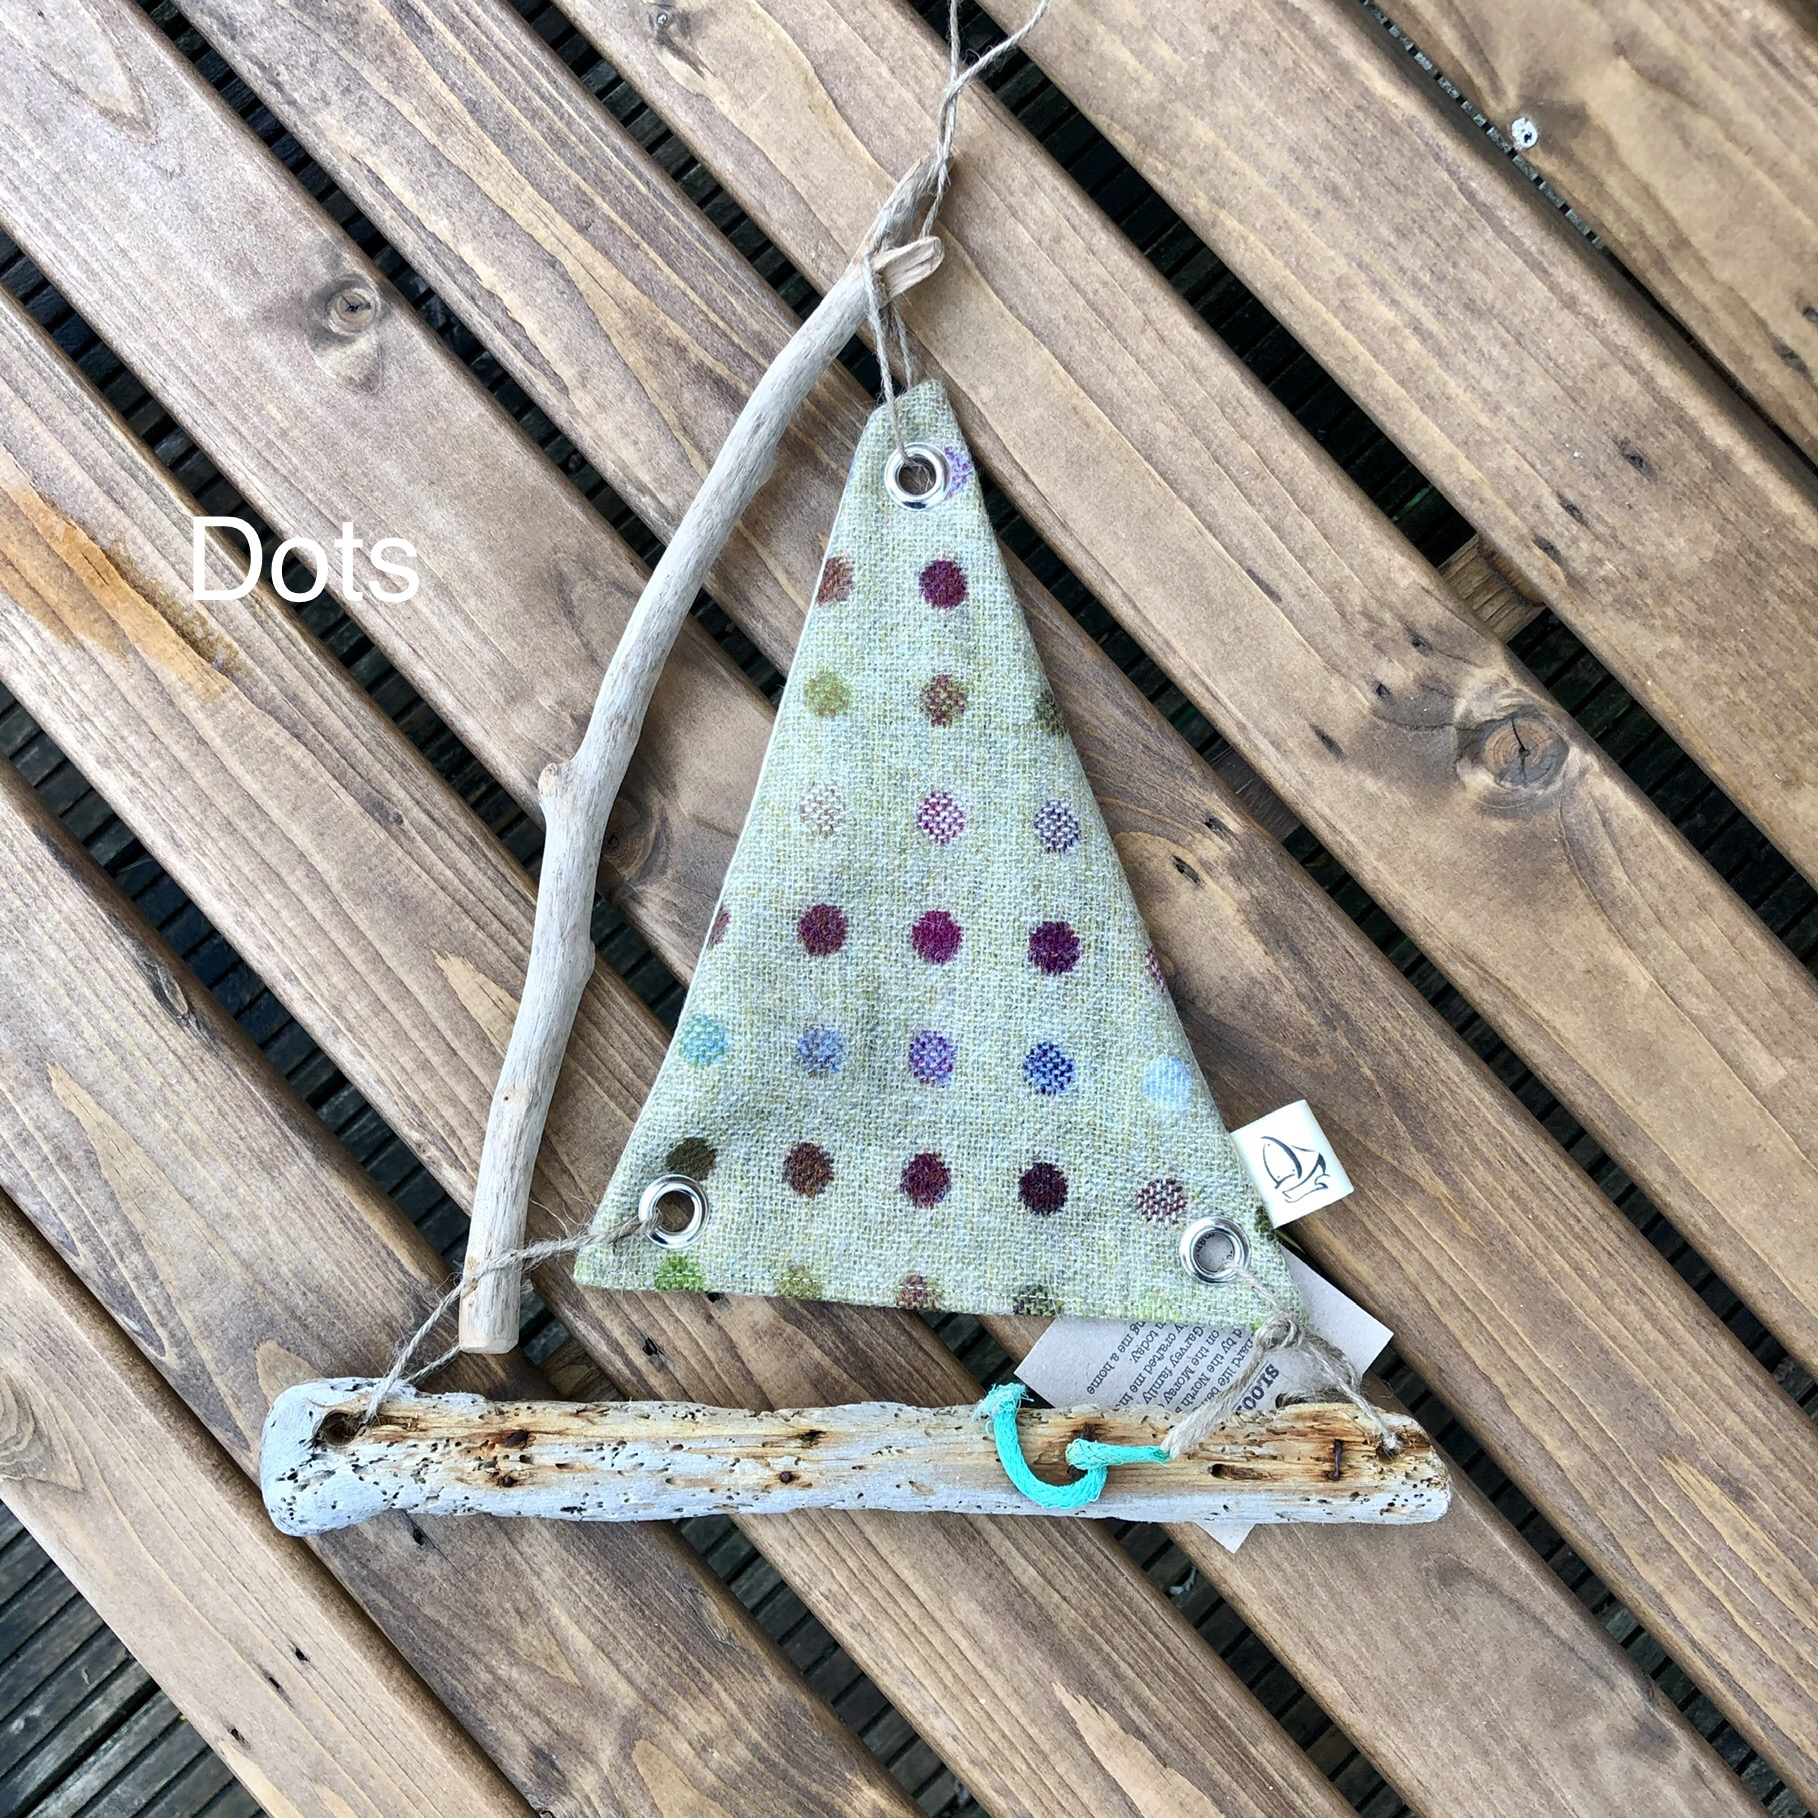 Driftwood Sloop, Handmade